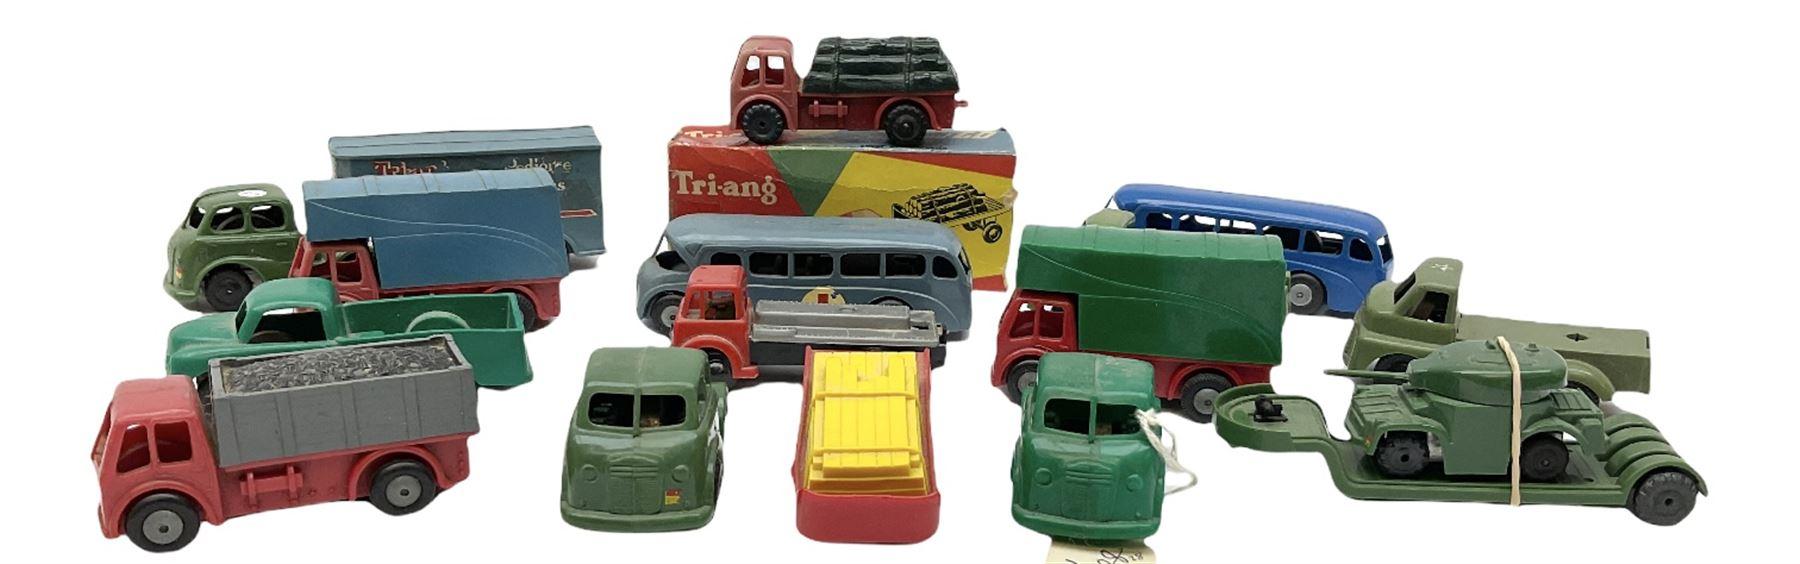 Tri-ang/Tri-ang Minic - twelve plastic friction-drive vehicles comprising Tri-ang Toys/Pedigree Pram